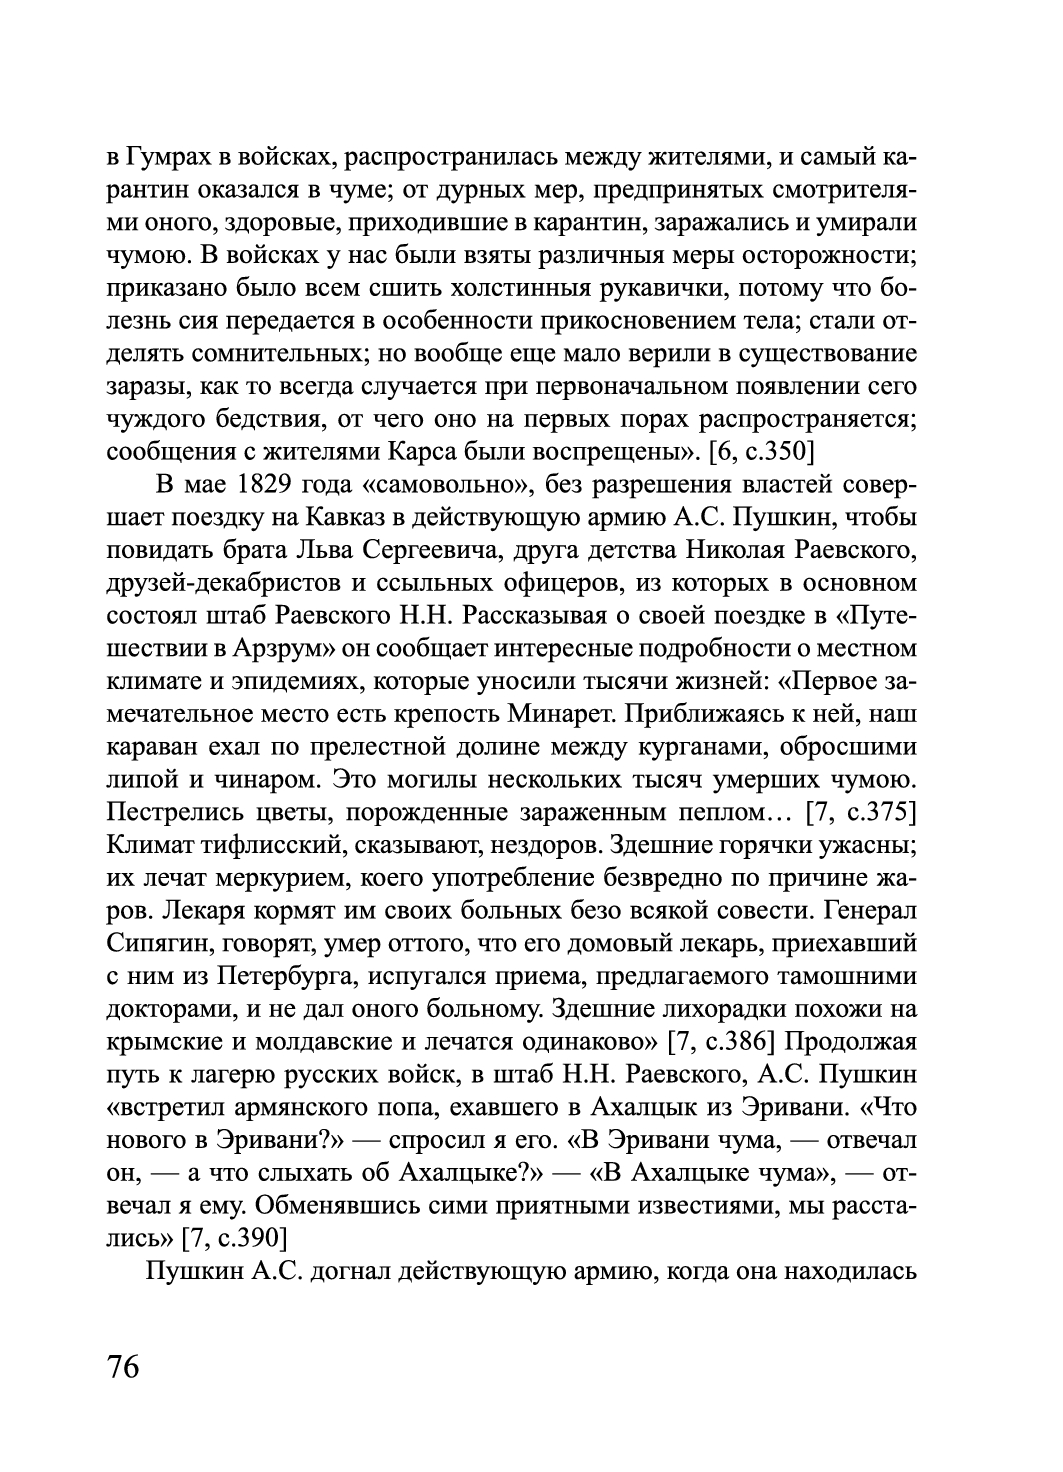 http://forumupload.ru/uploads/001a/7d/26/3/574066.jpg